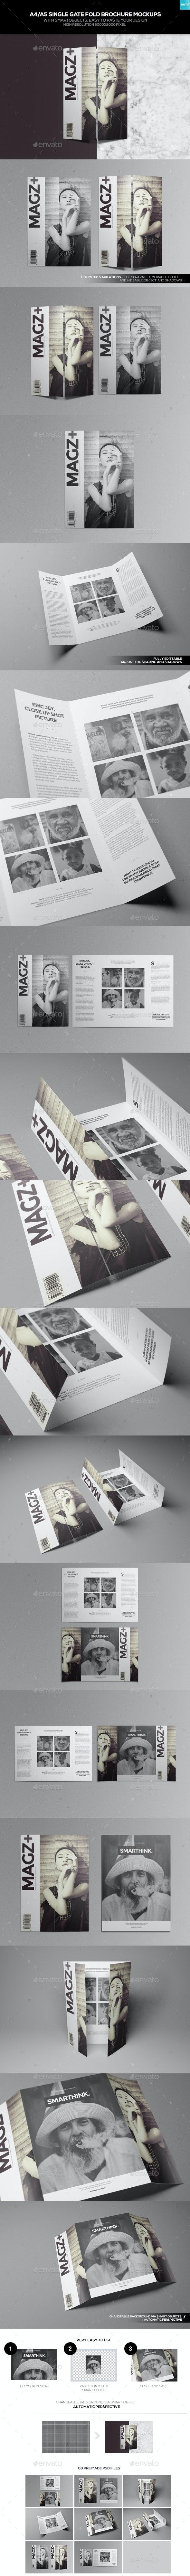 A4/ A5 Single Gate Fold Brochure Mockups - Brochures Print